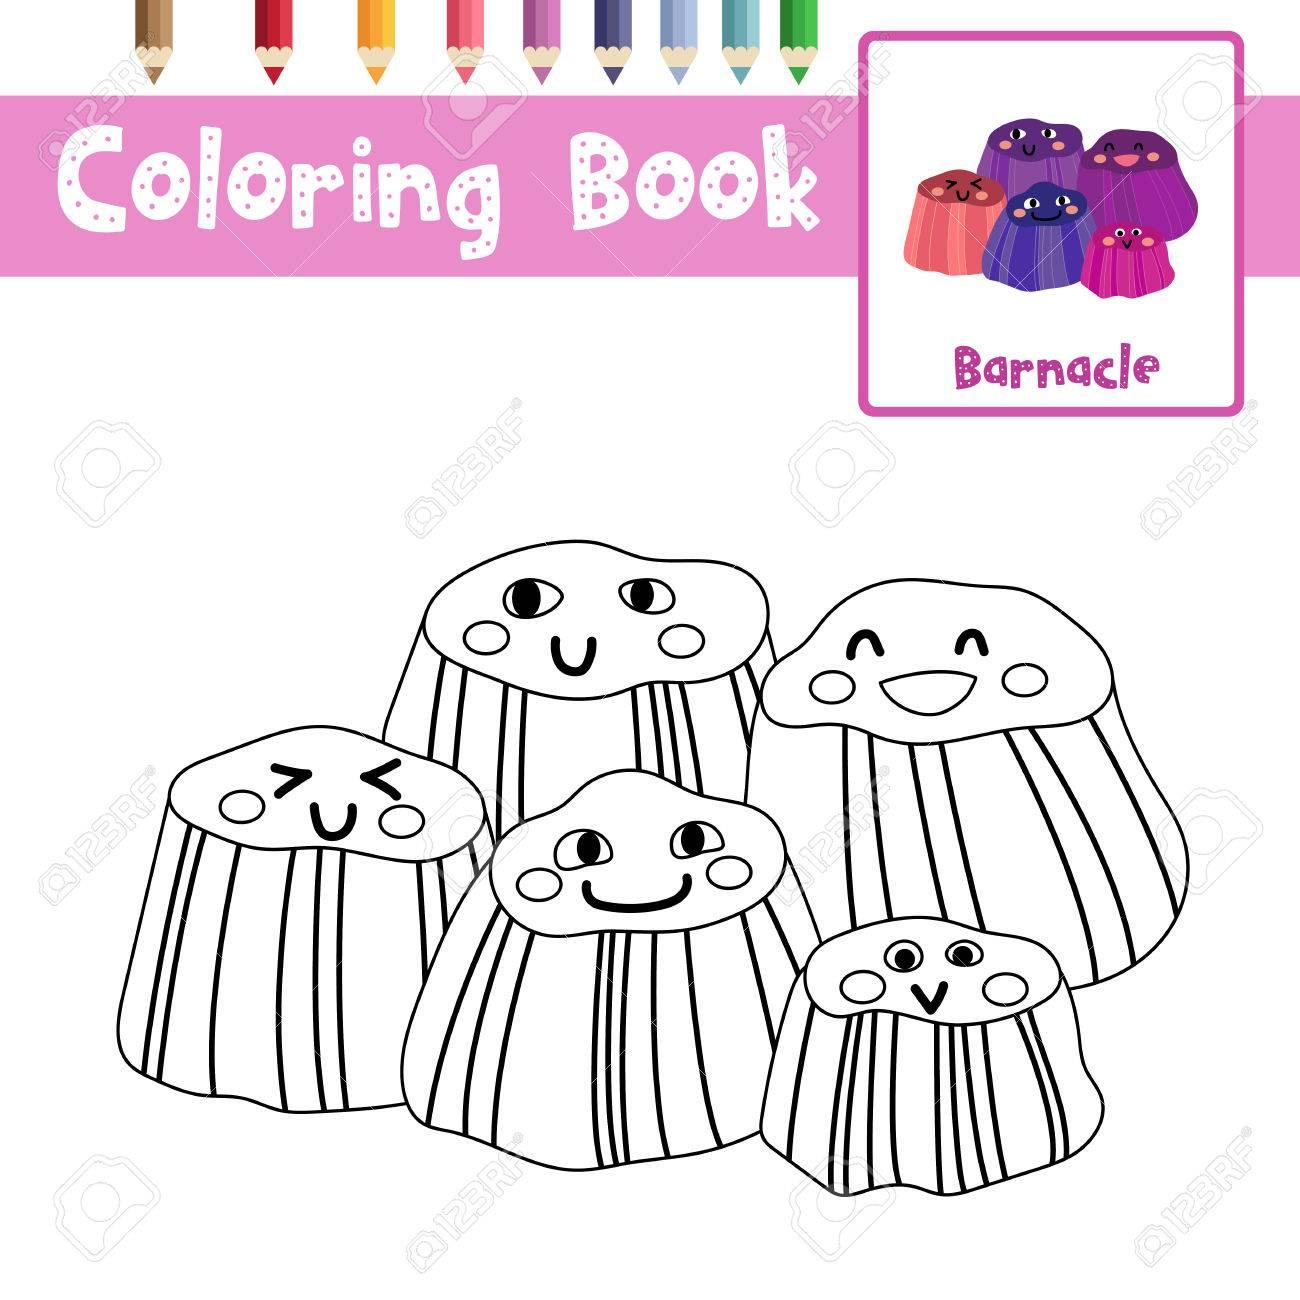 86380137-coloring-page-of-barnacles-animals-for-preschool-kids-activity-educational-worksheet-vector-illustra.jpg